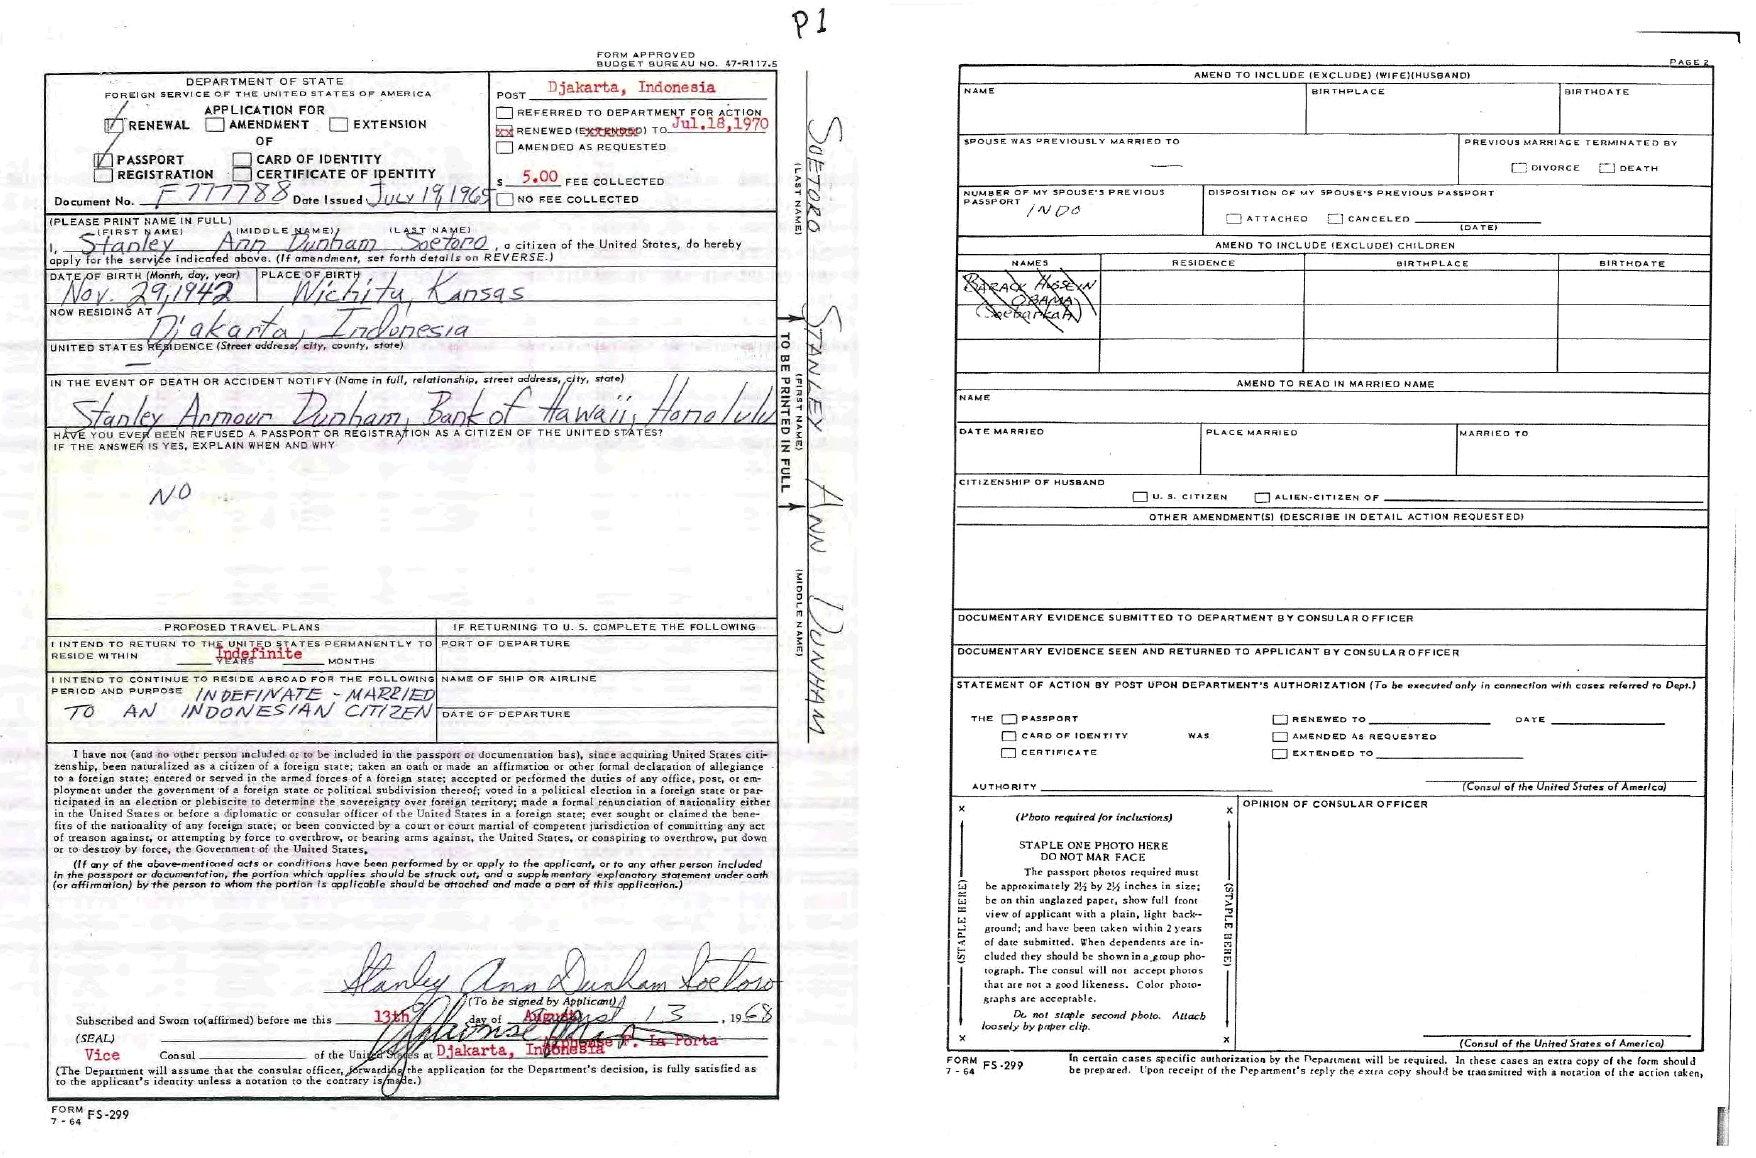 Ann-Dunham-Soetoro-1968-Passport-Renewal-Application